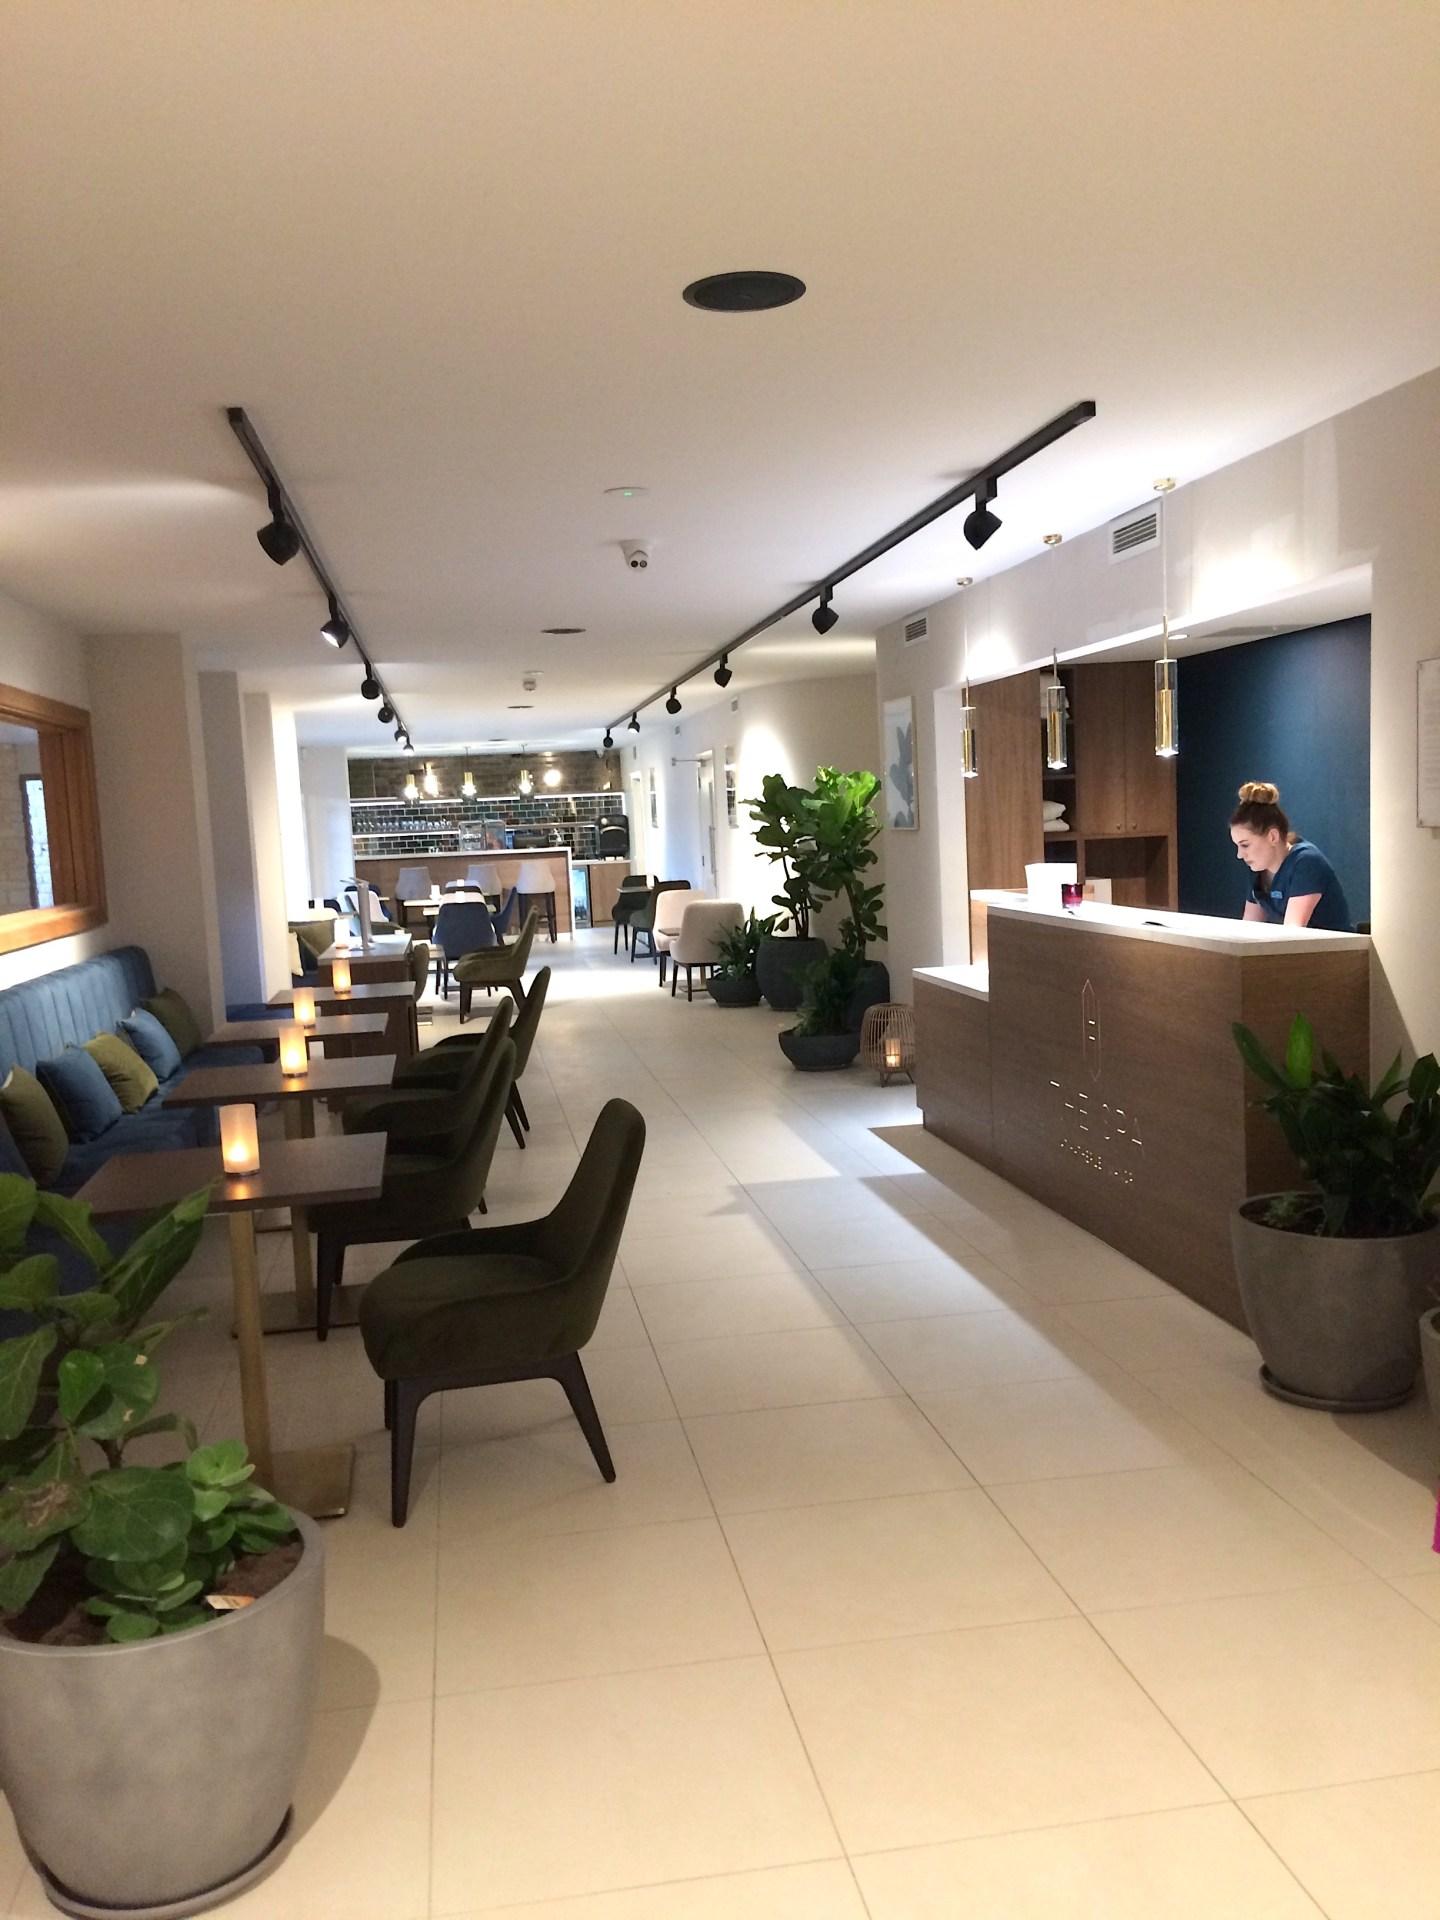 Spa Reception at Hatherley Manor Hotel